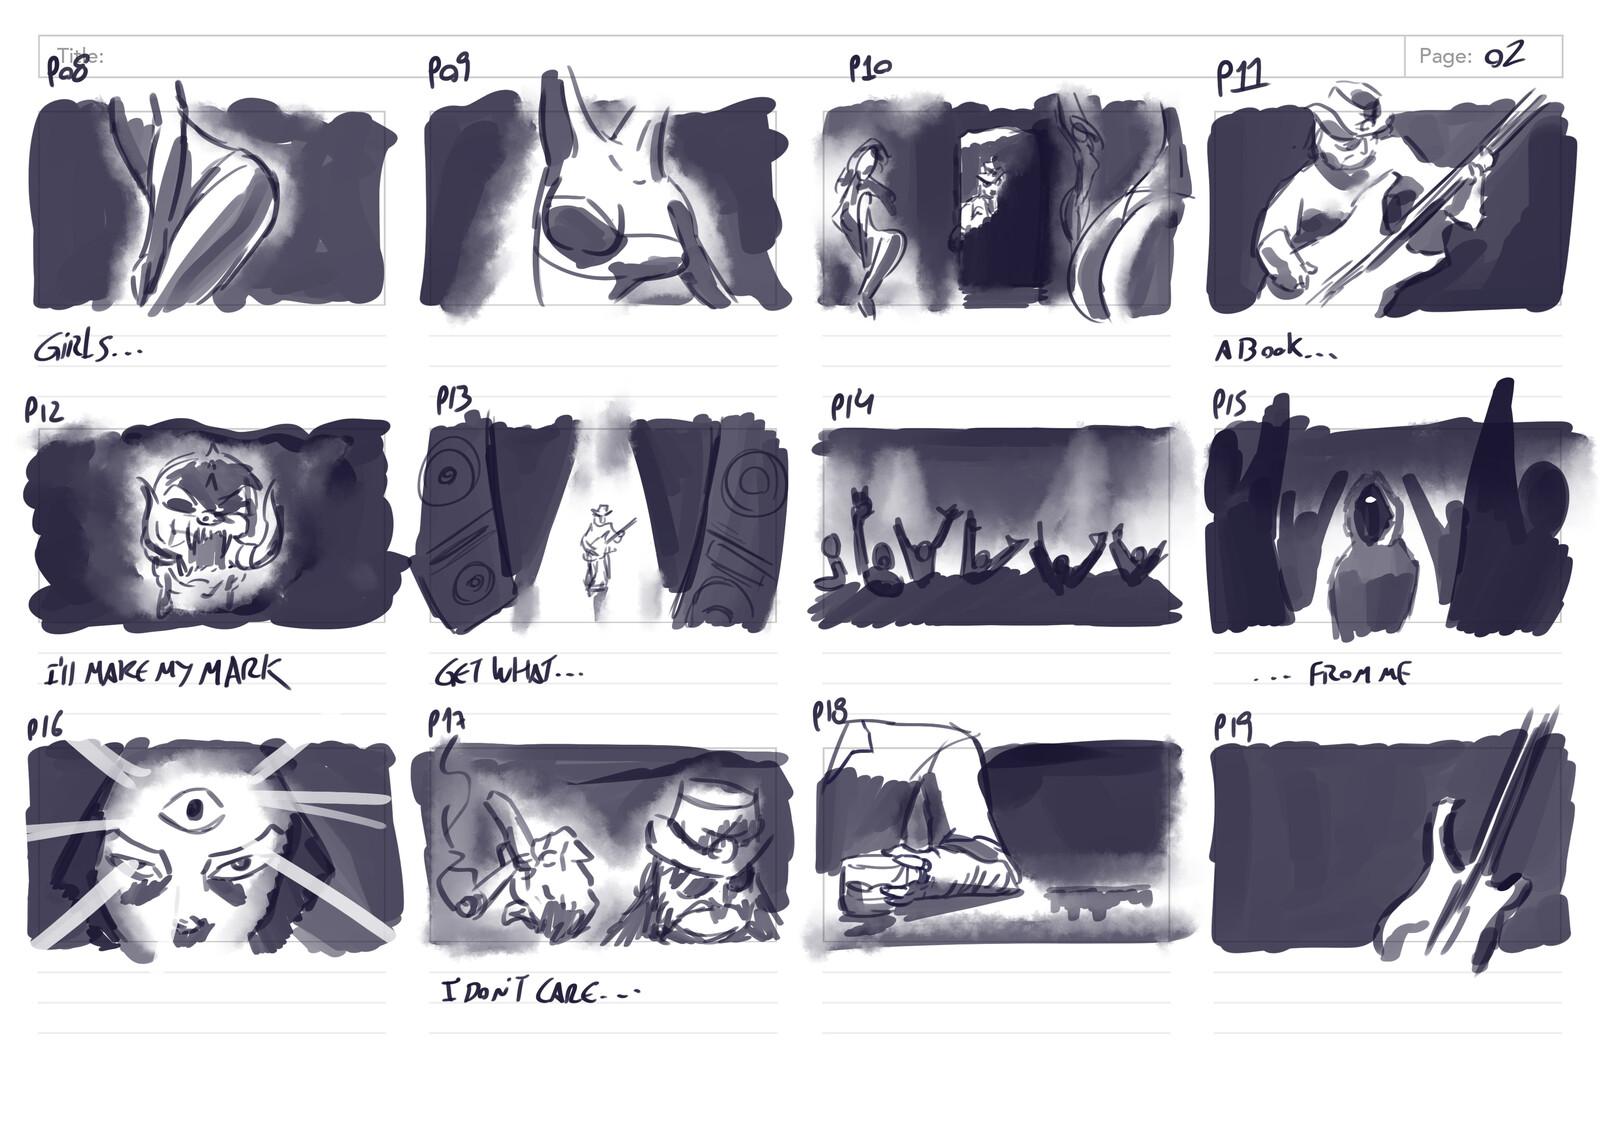 Storyboard 2/6